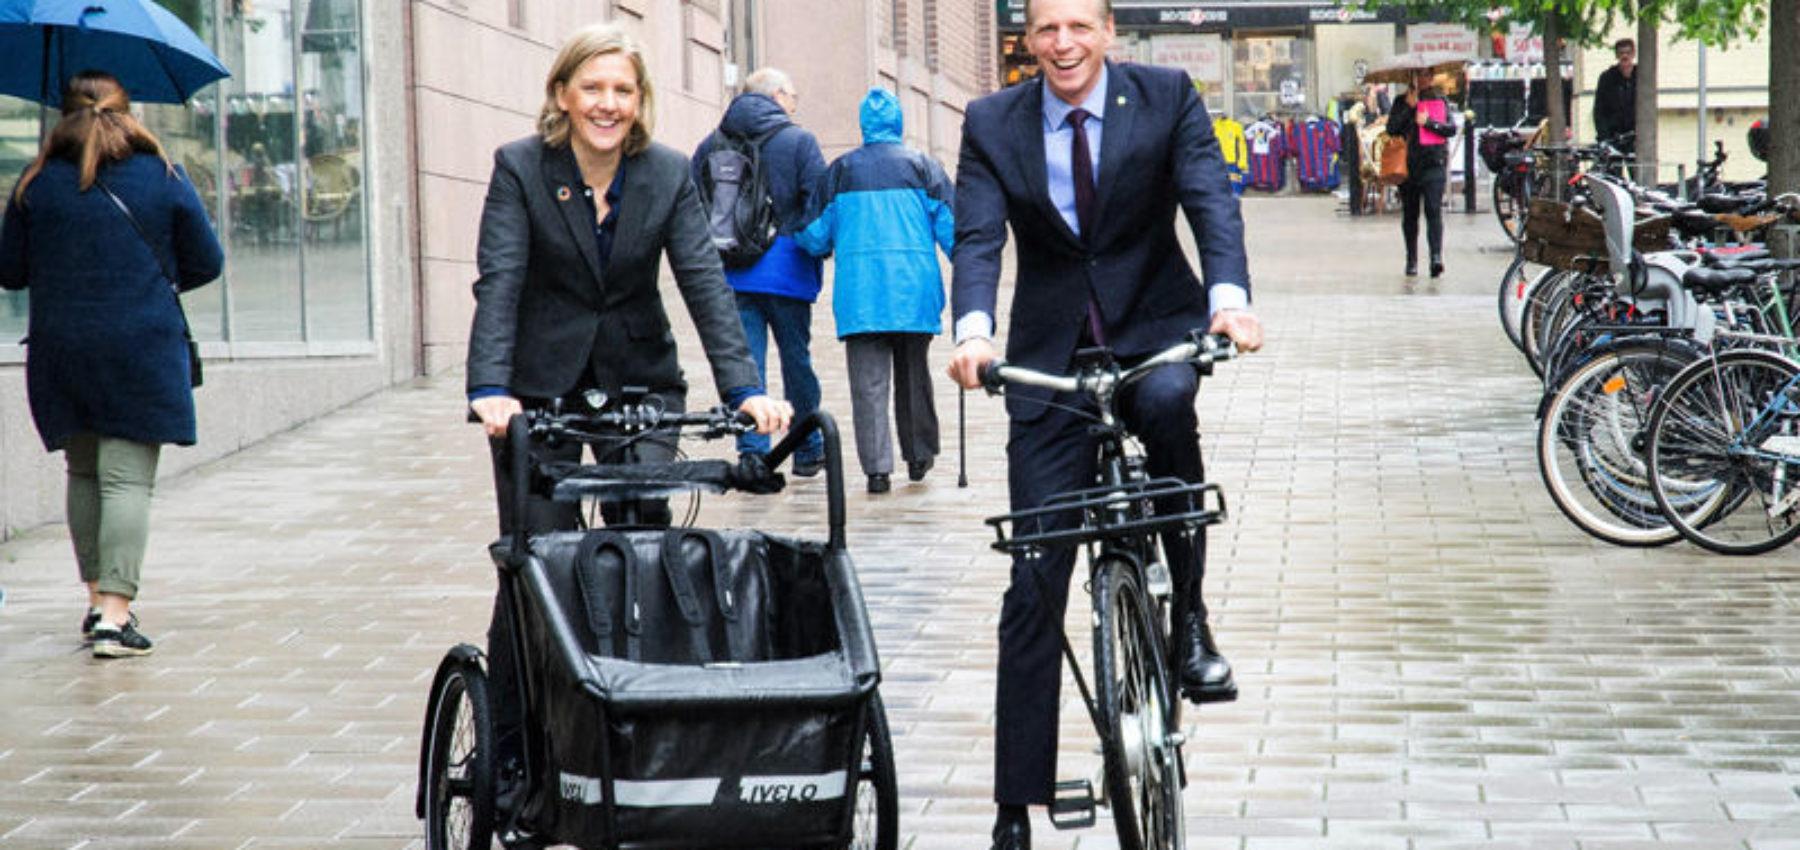 svenske ministre på elsykkel